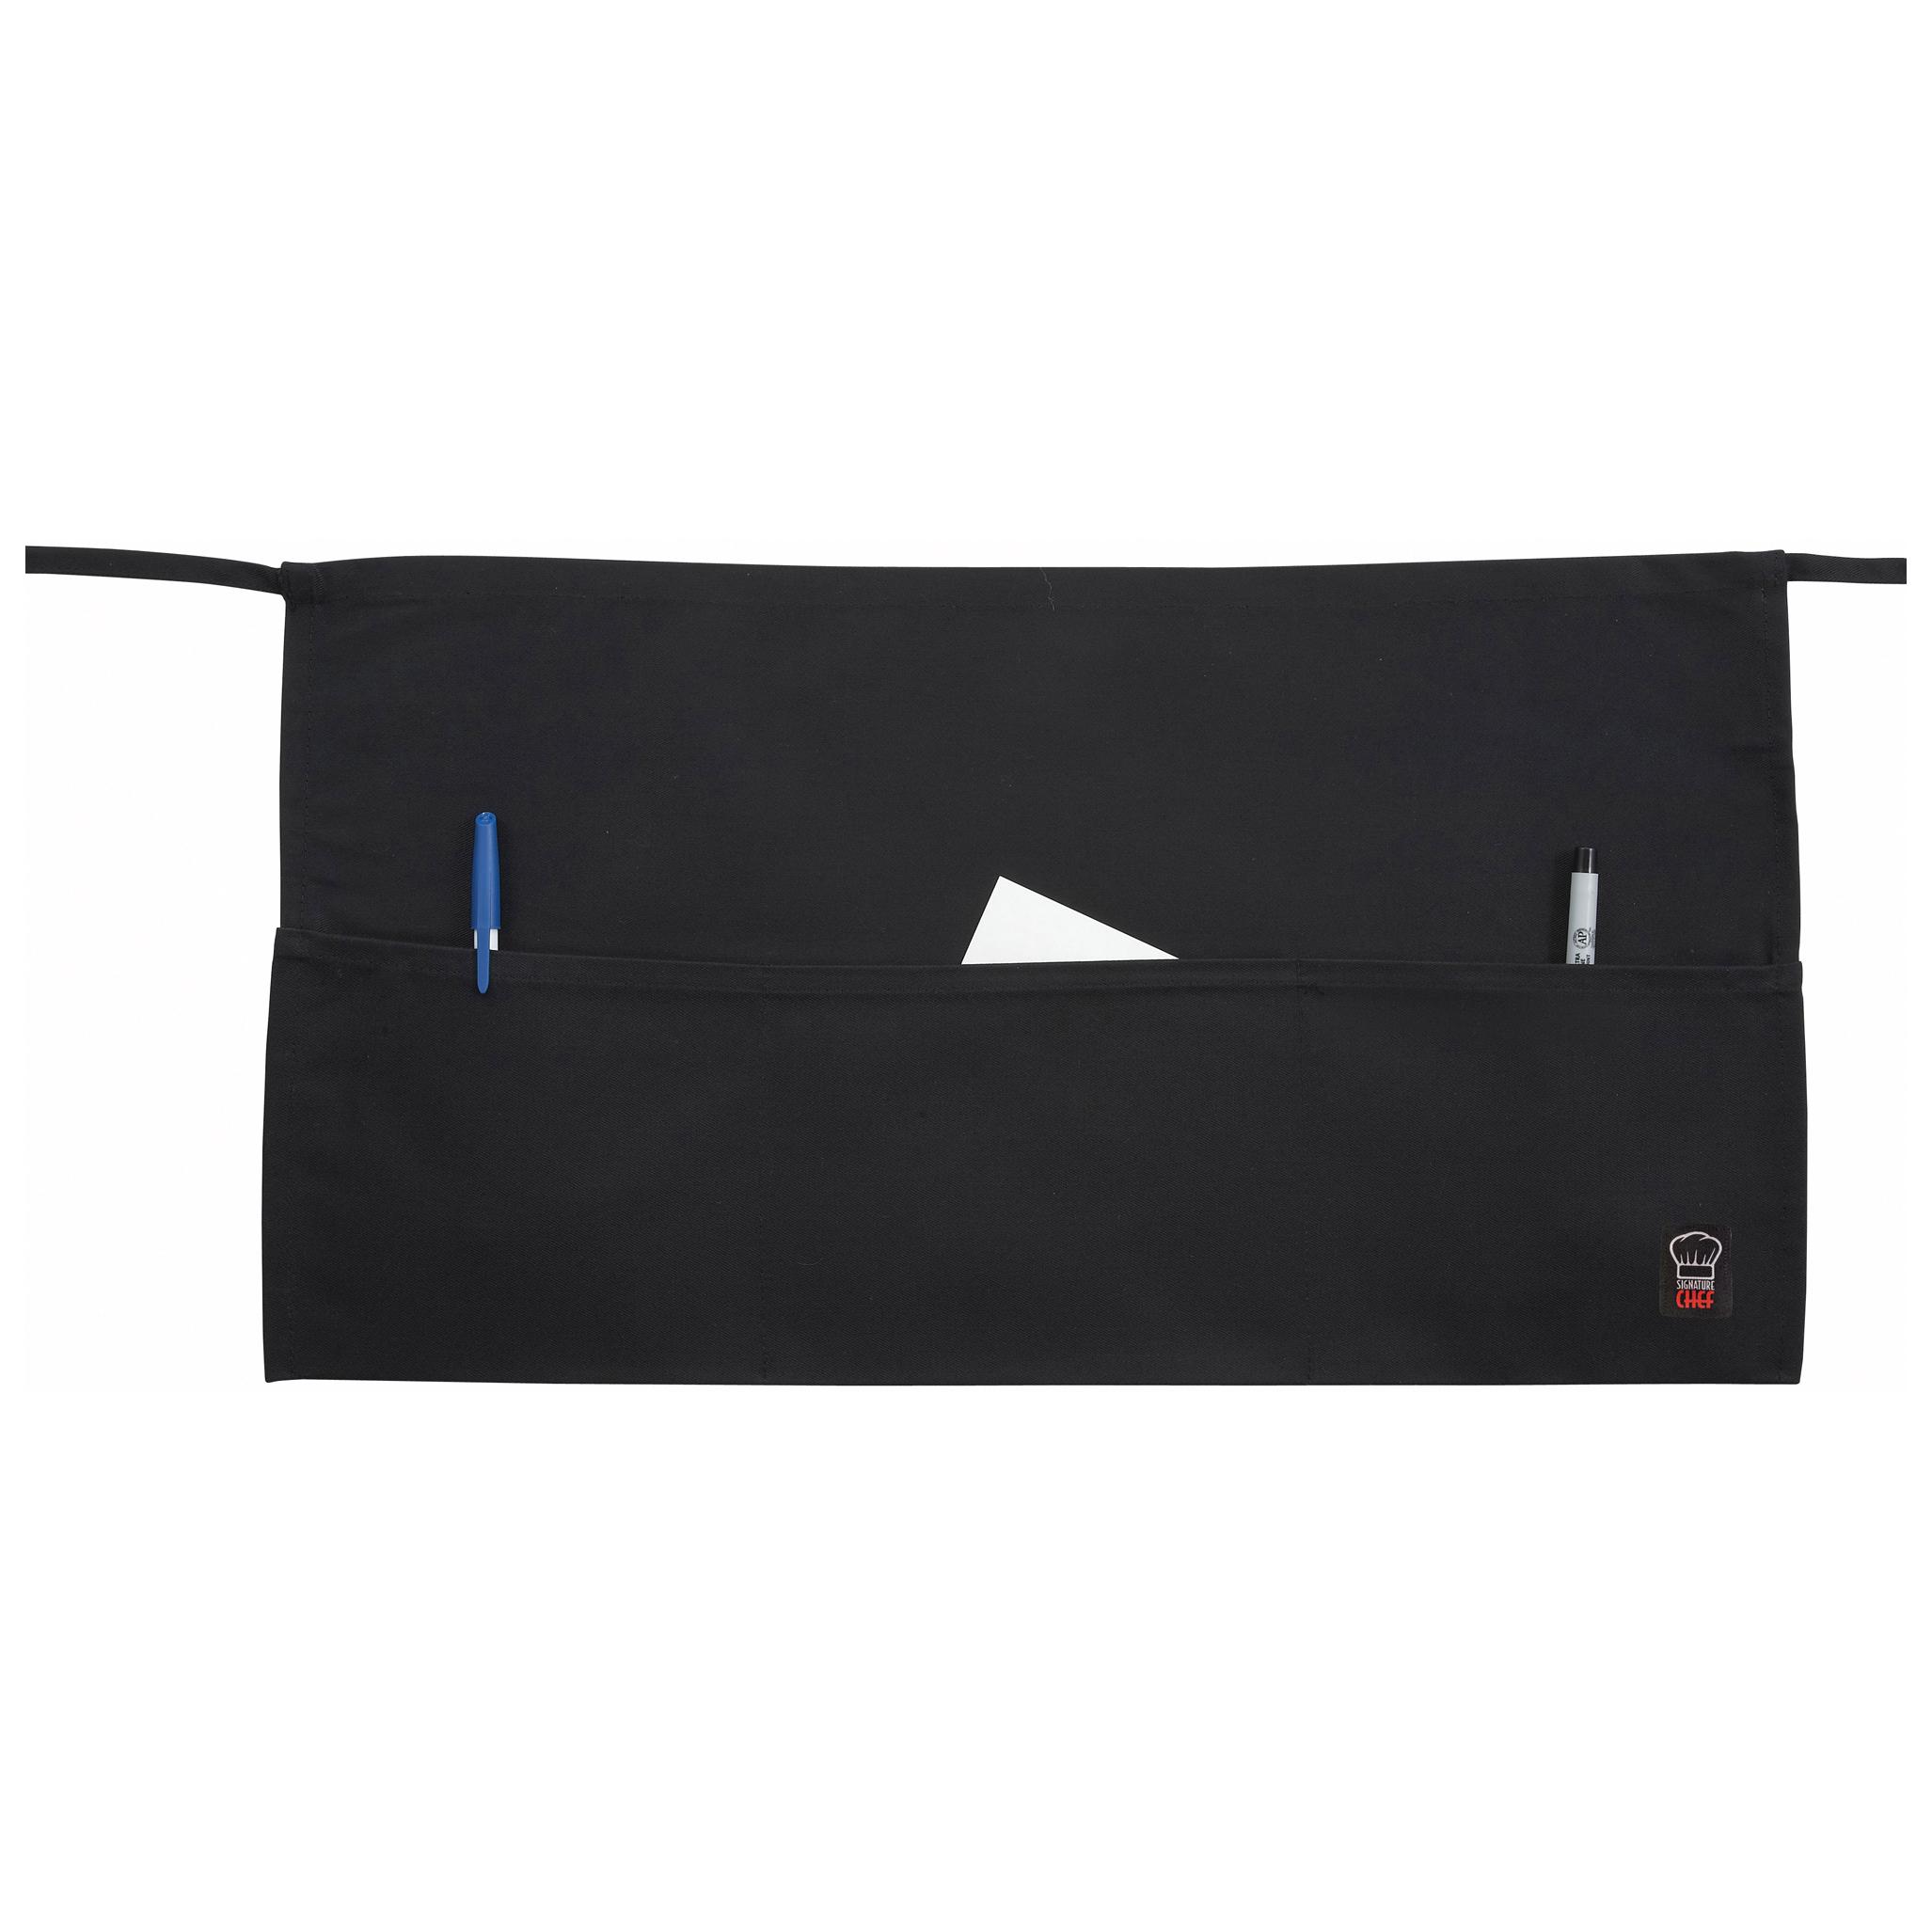 1550-71 Winco WA-1221 waist apron